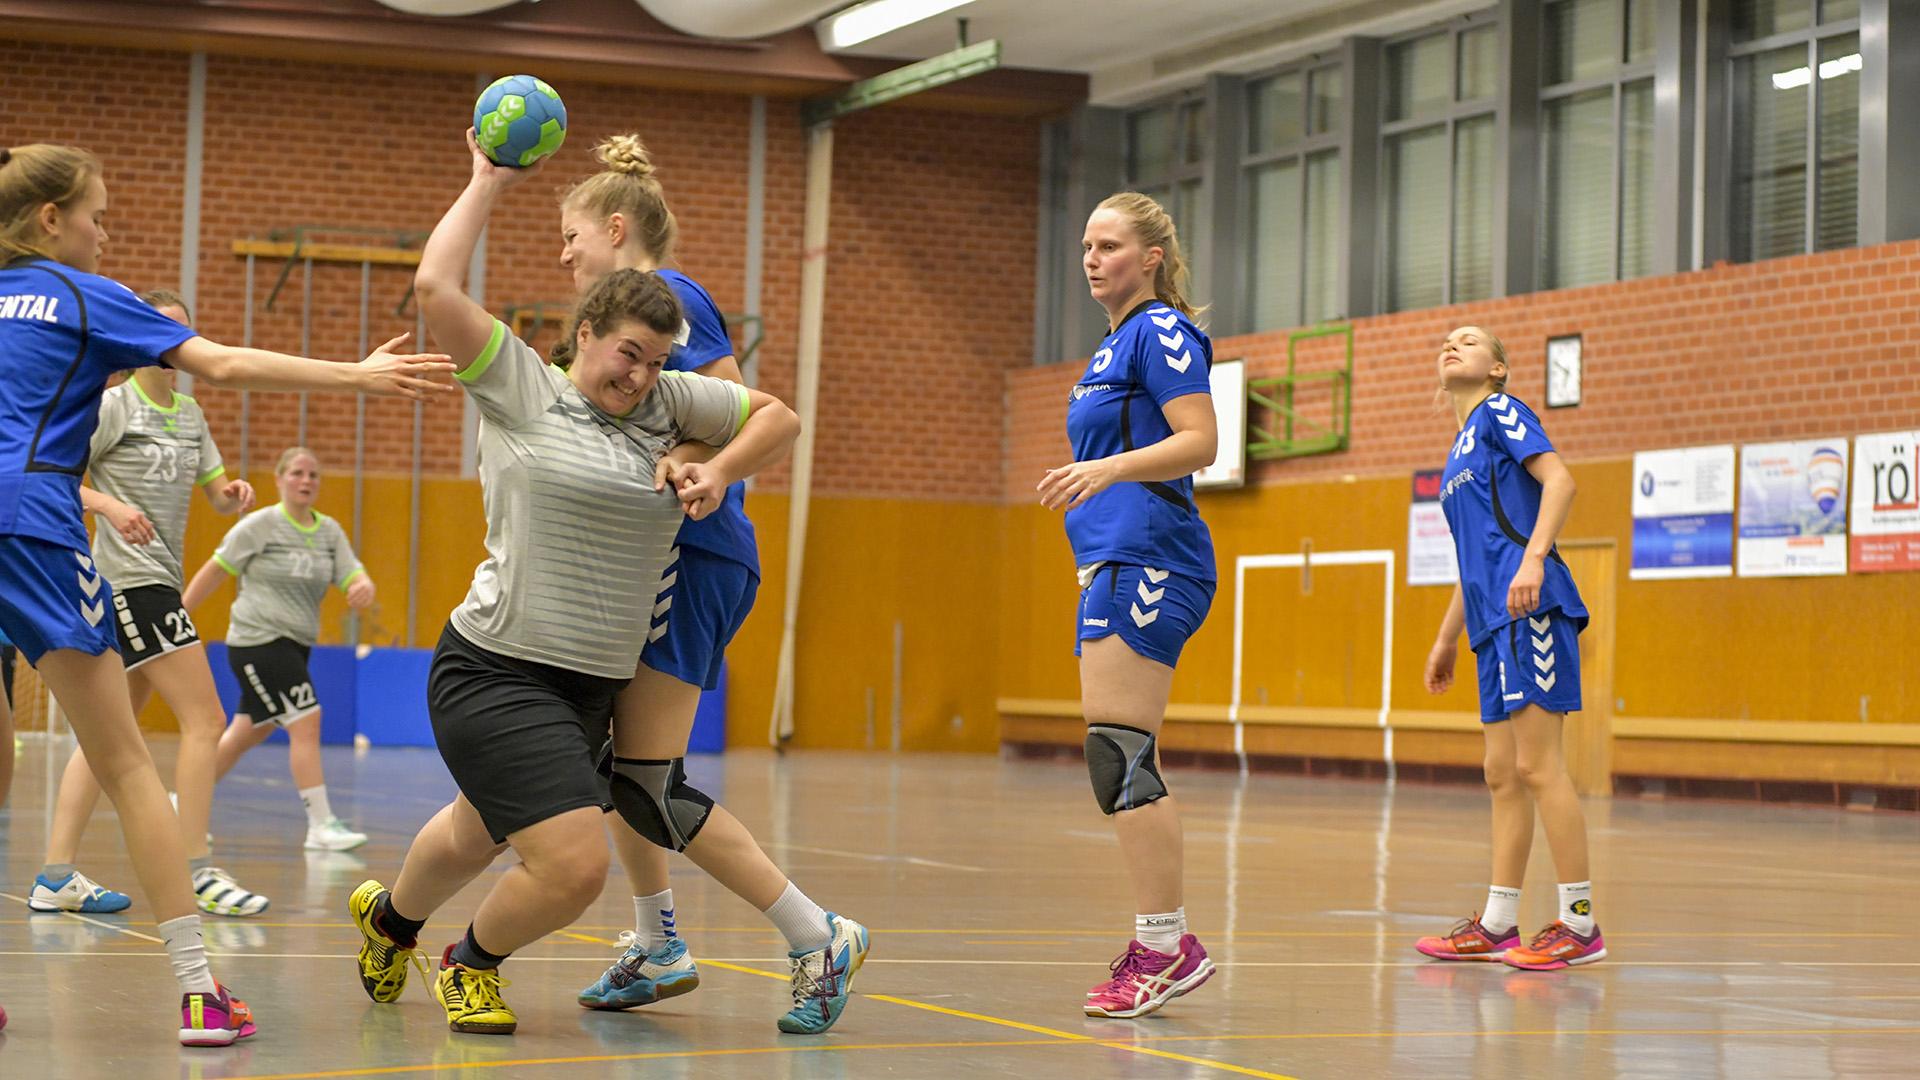 004Slider_Damen_tsg_leutkirch_handball